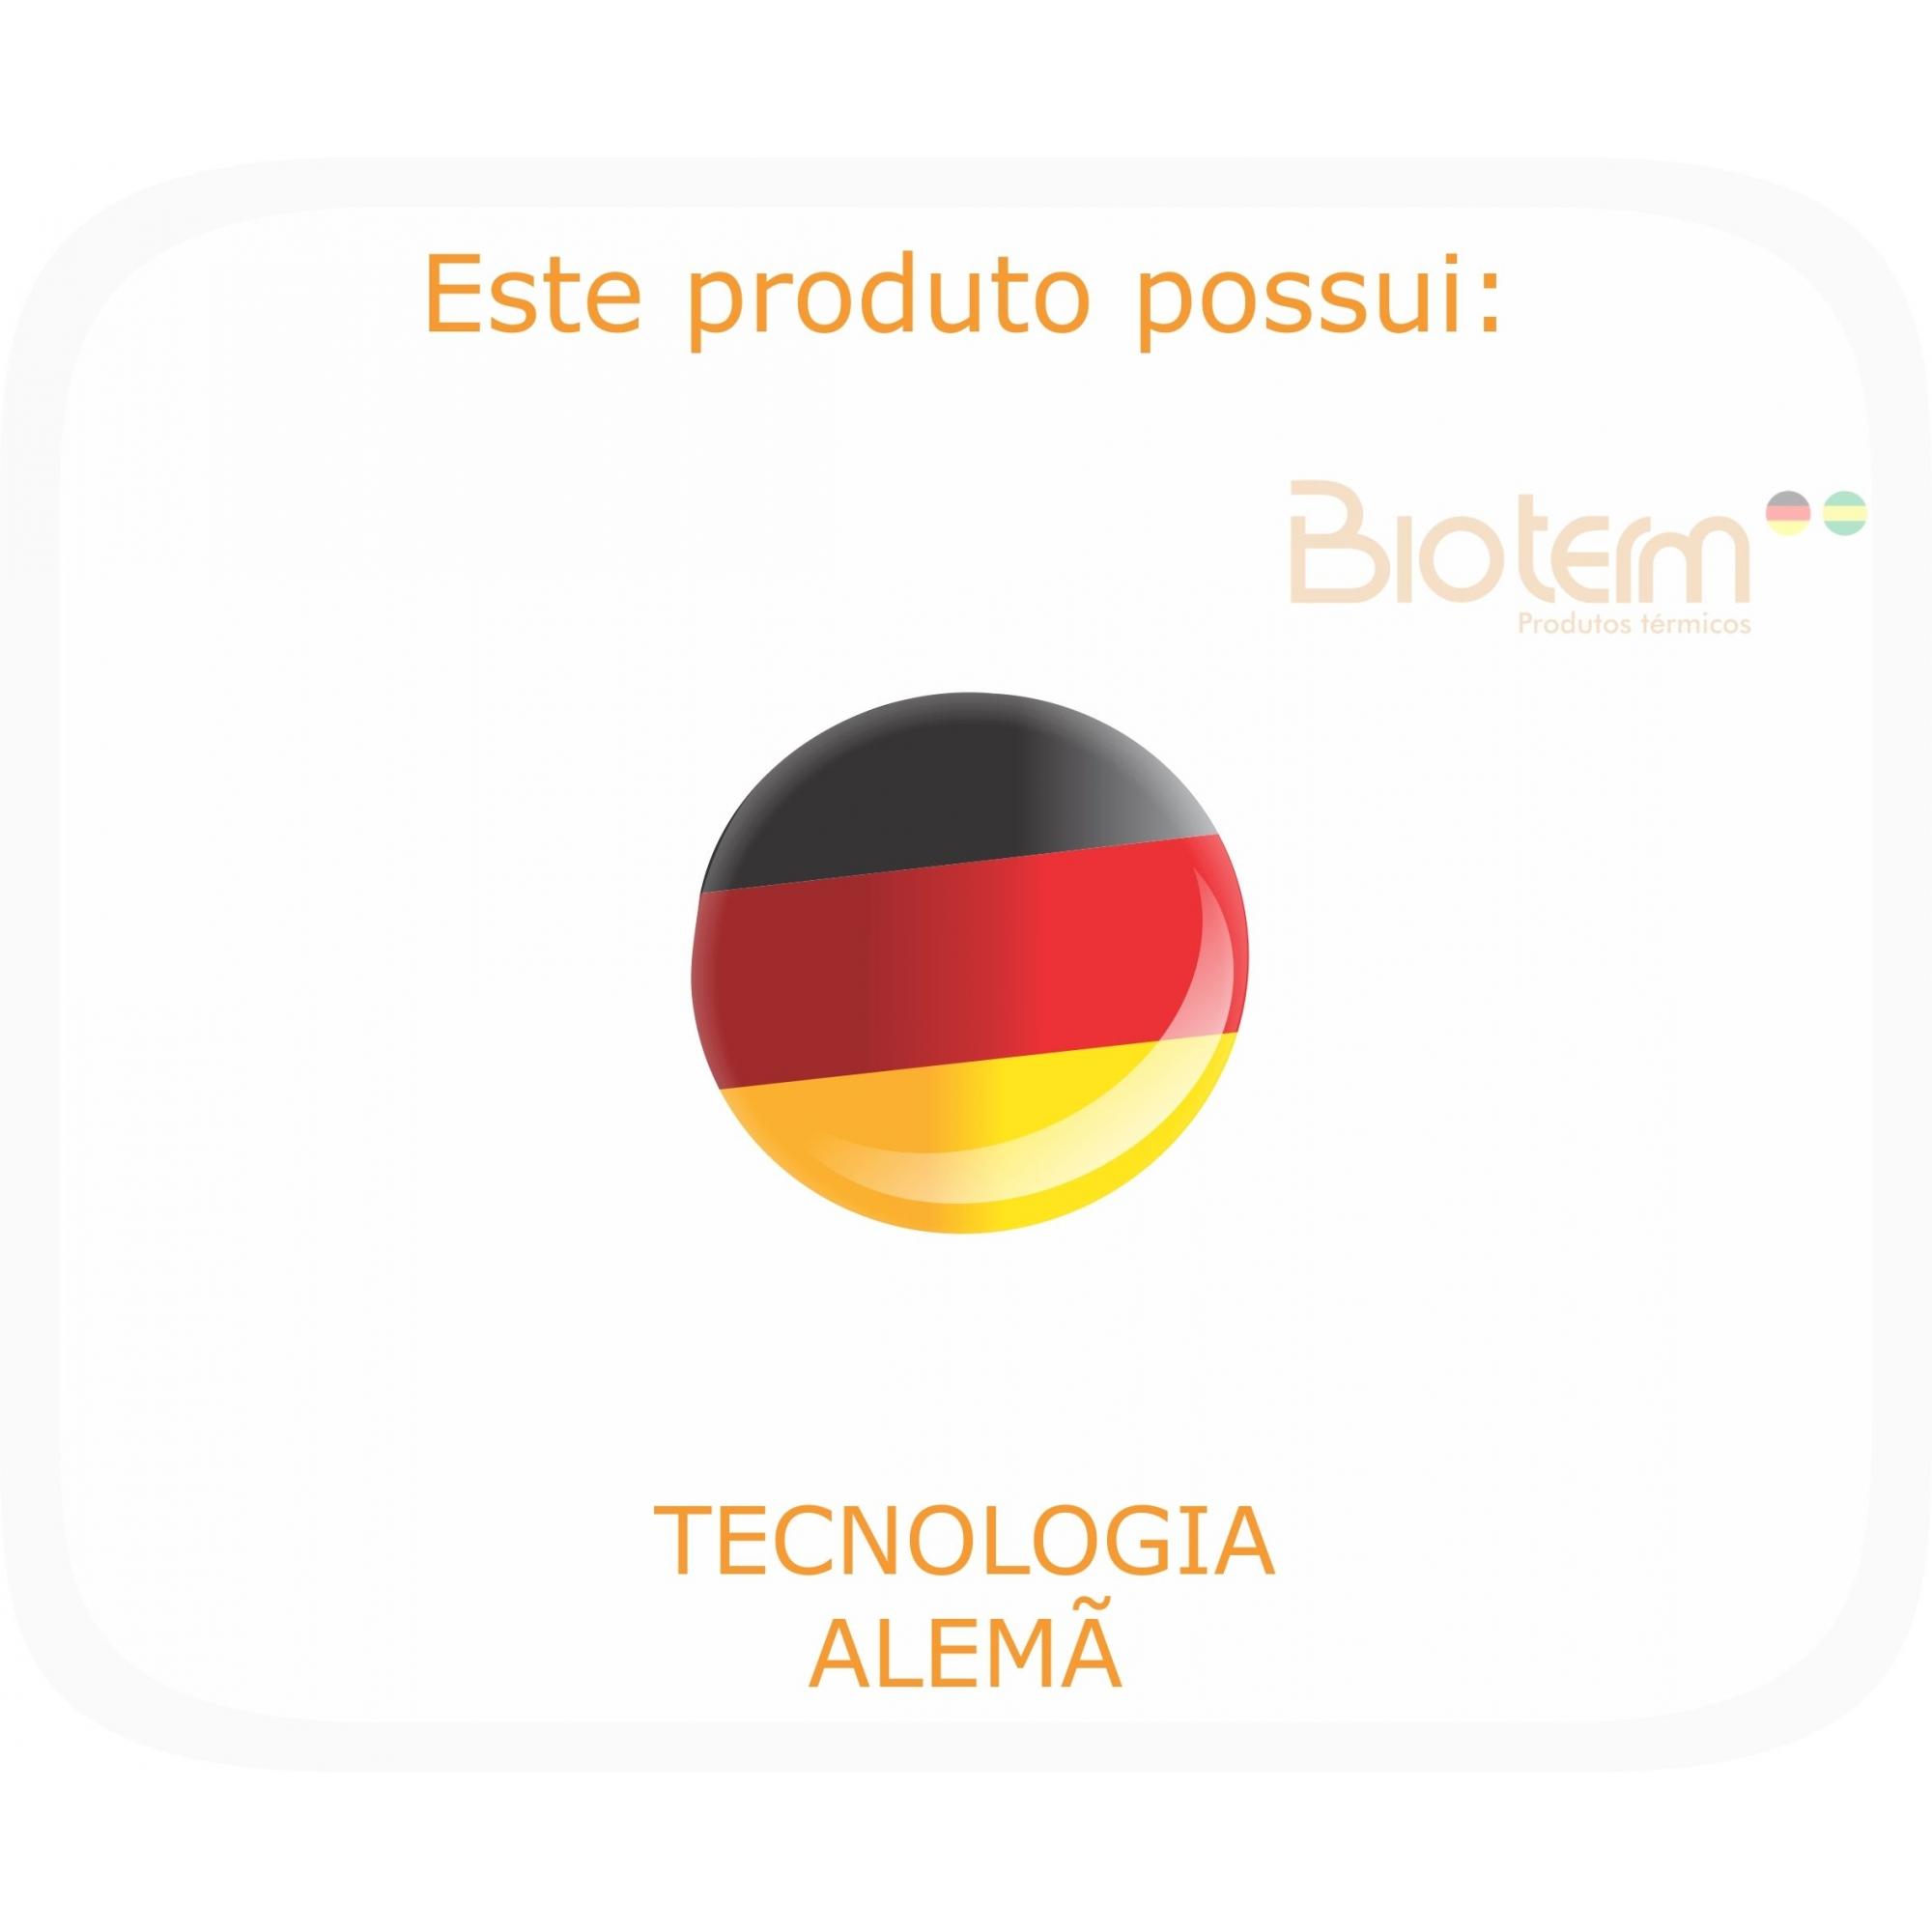 Lençol Térmico Queen Size Digital Bivolt Automático Bio Term